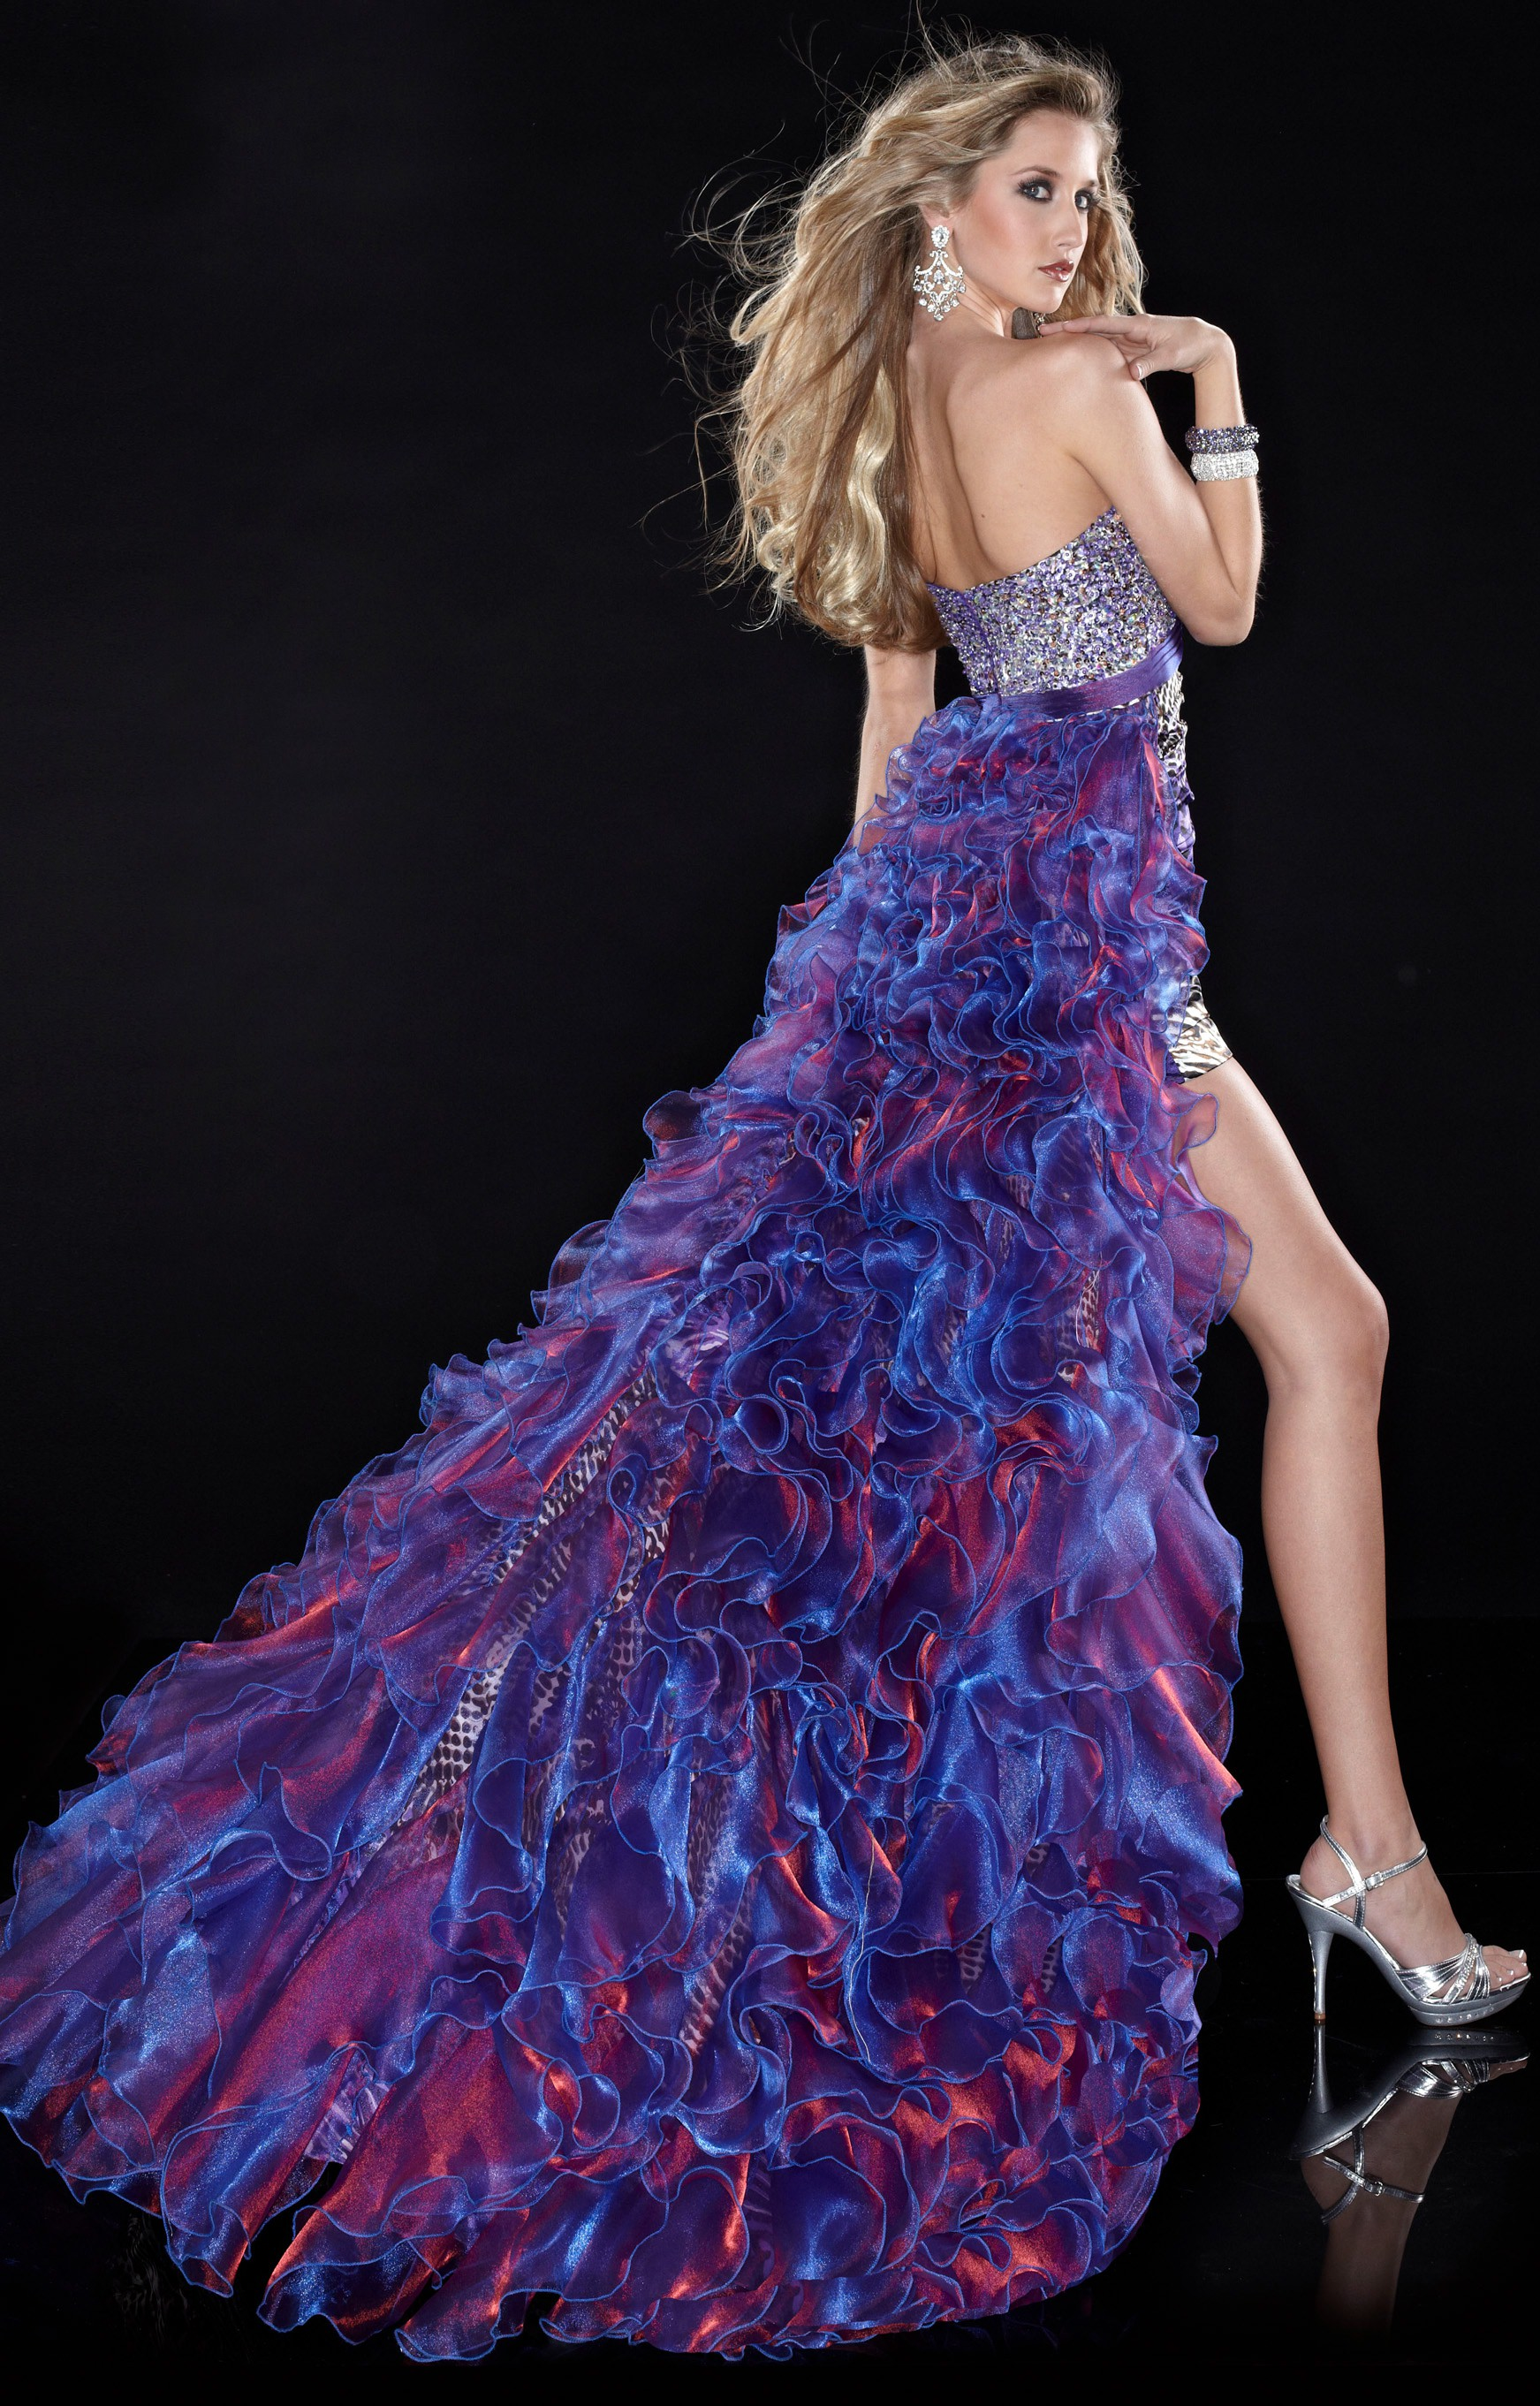 Panoply 14419 - Embrace You Wild Side Prom Dress